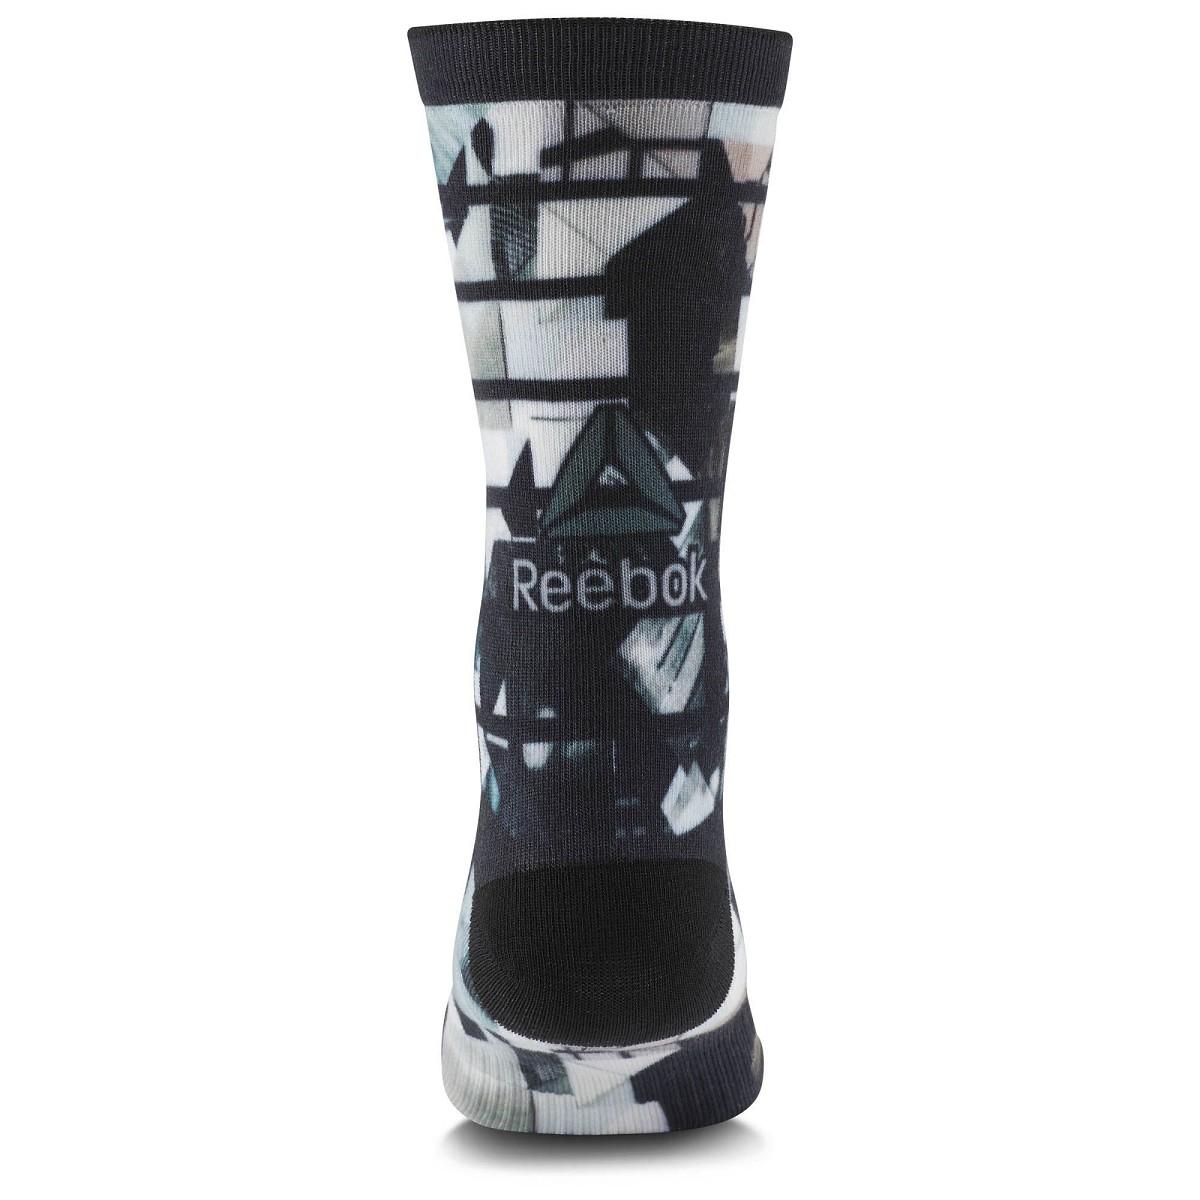 Calza Reebok Crossfit Cd1292 Printed Unisex Crew Nero